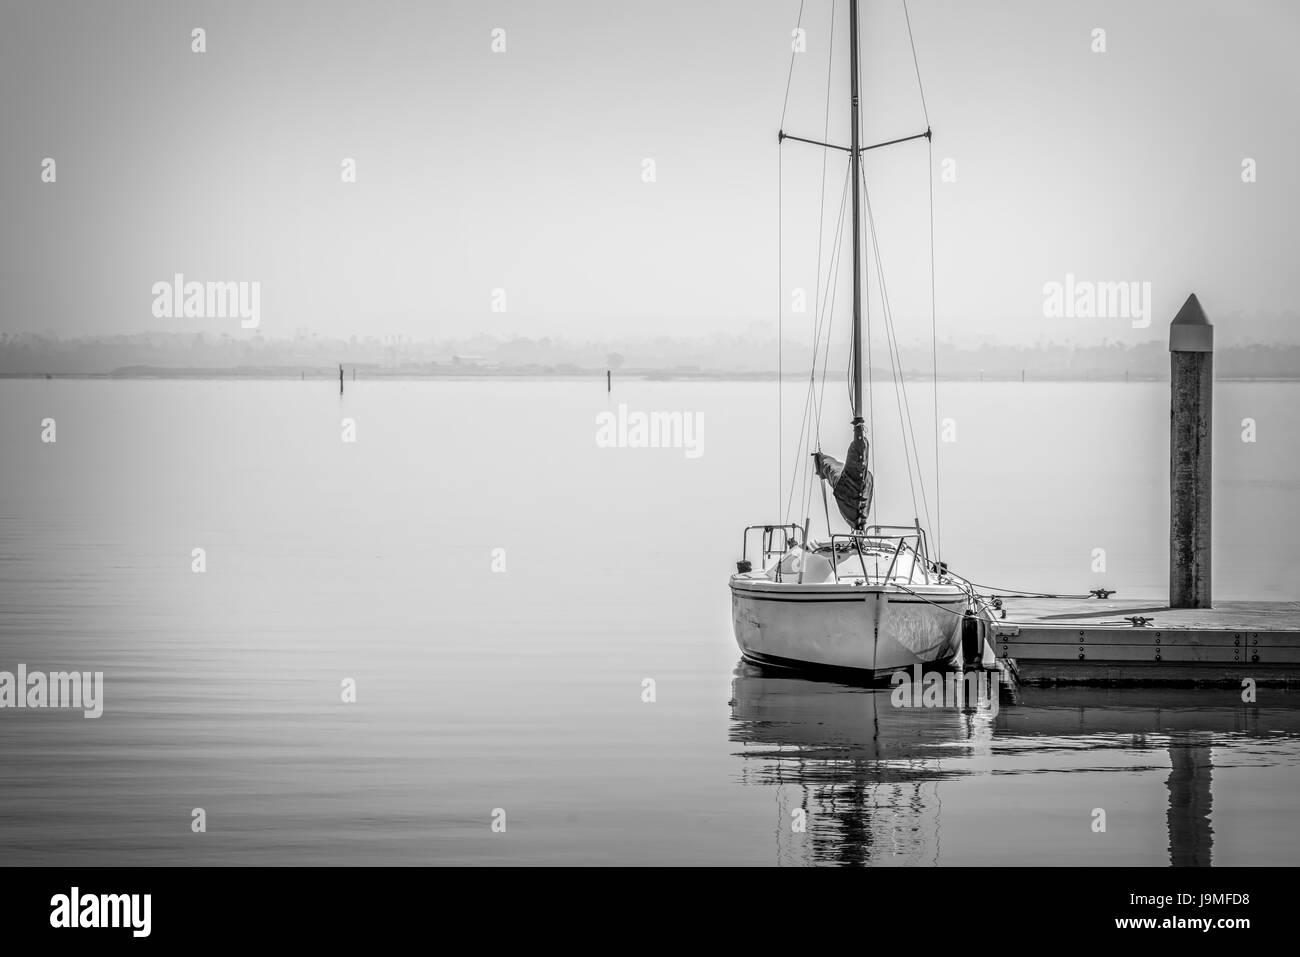 A boat at a southern California dock. - Stock Image